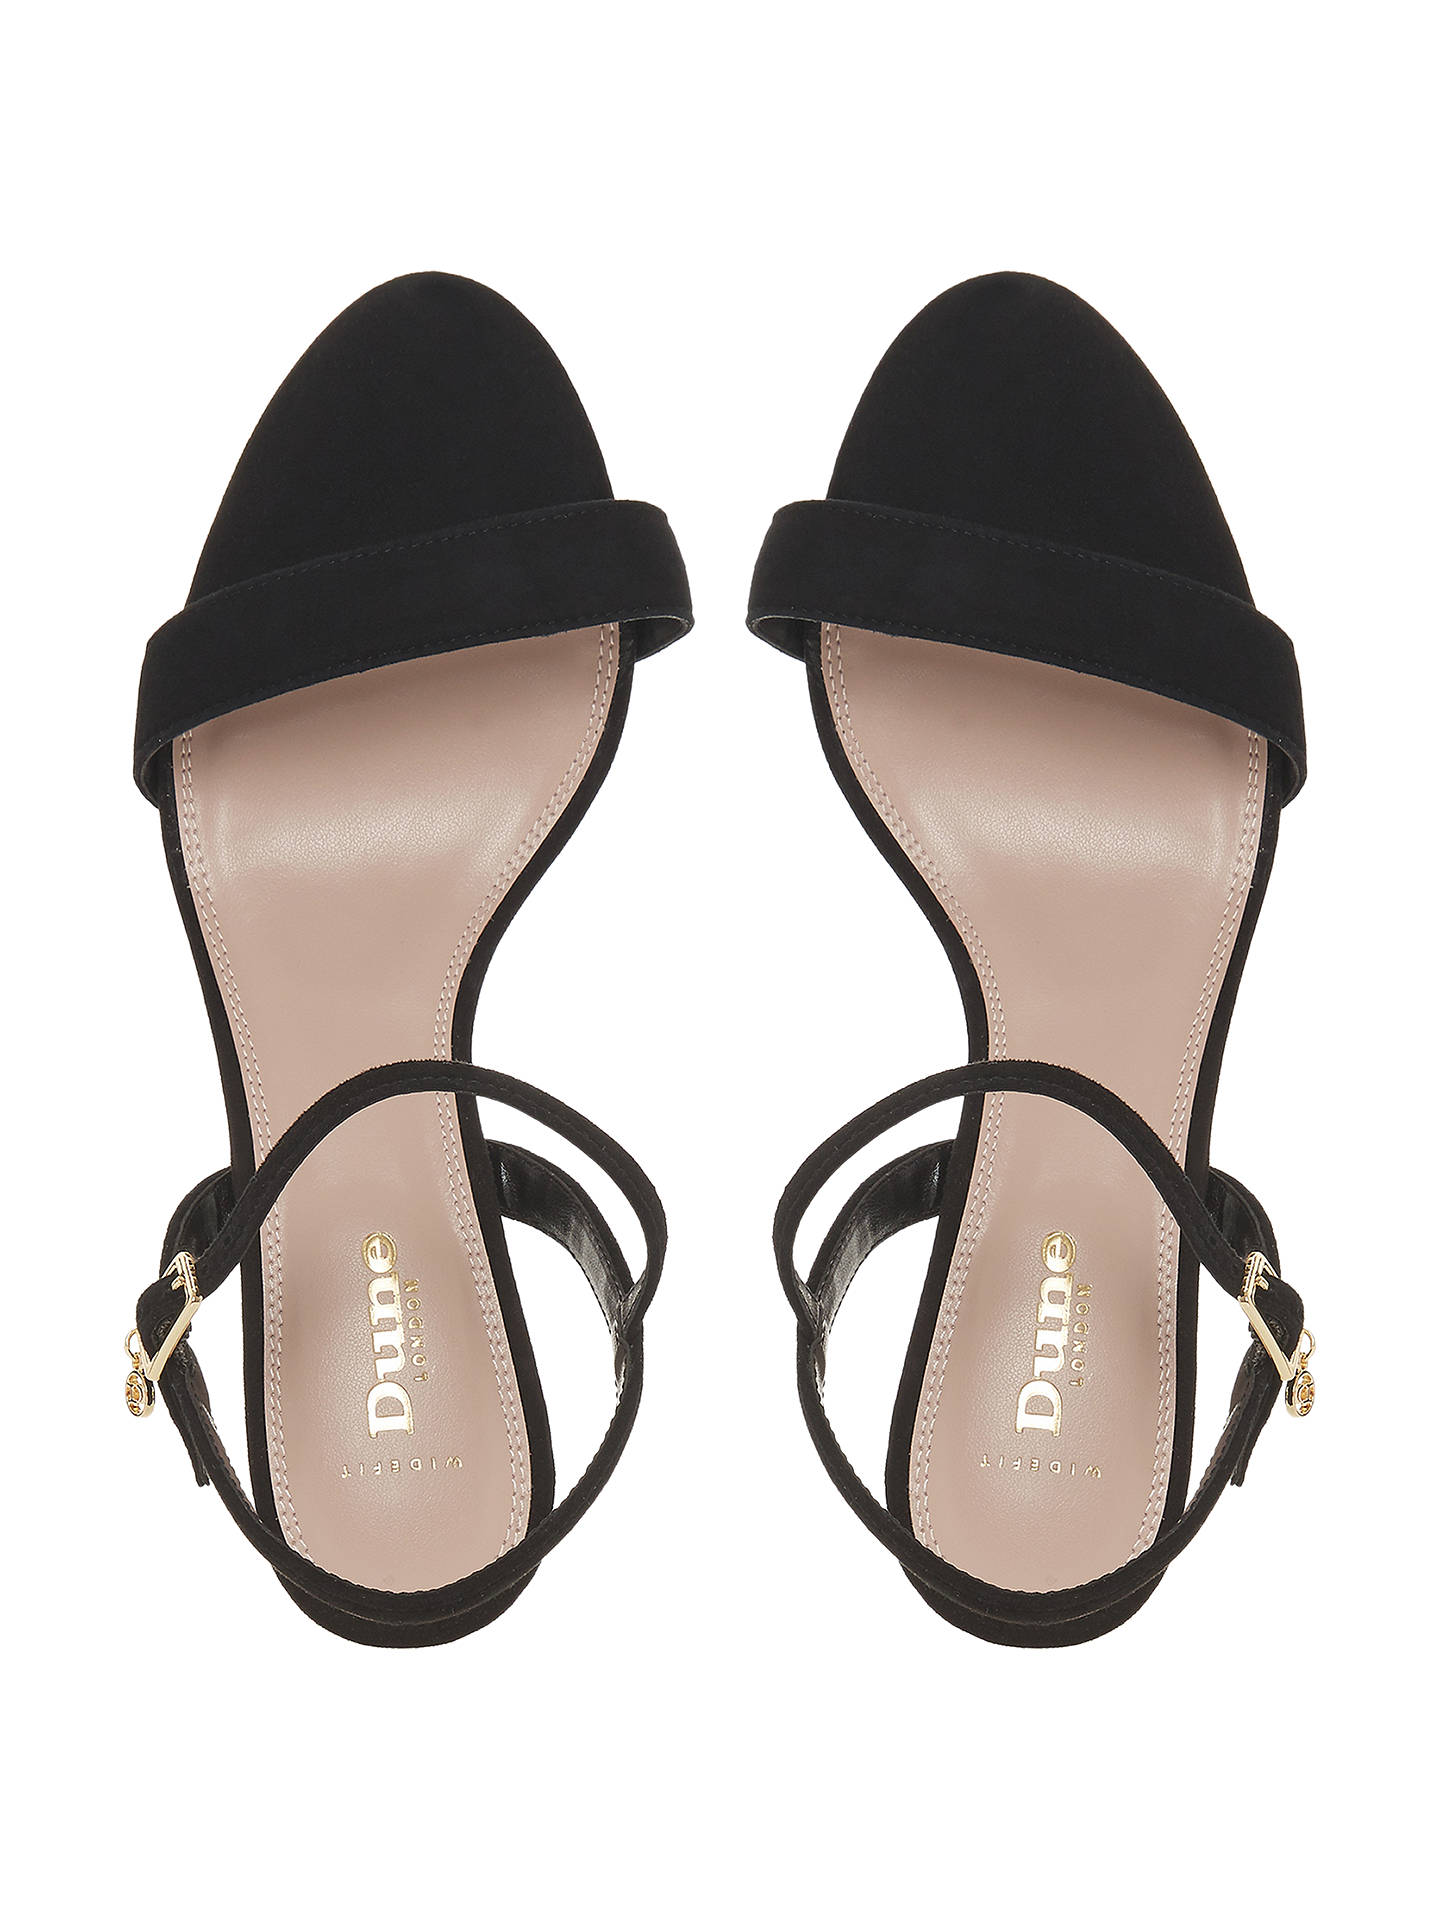 52a97cff2b4 ... Buy Dune Wide Fit Monnrow Two Part Kitten Heel Sandals